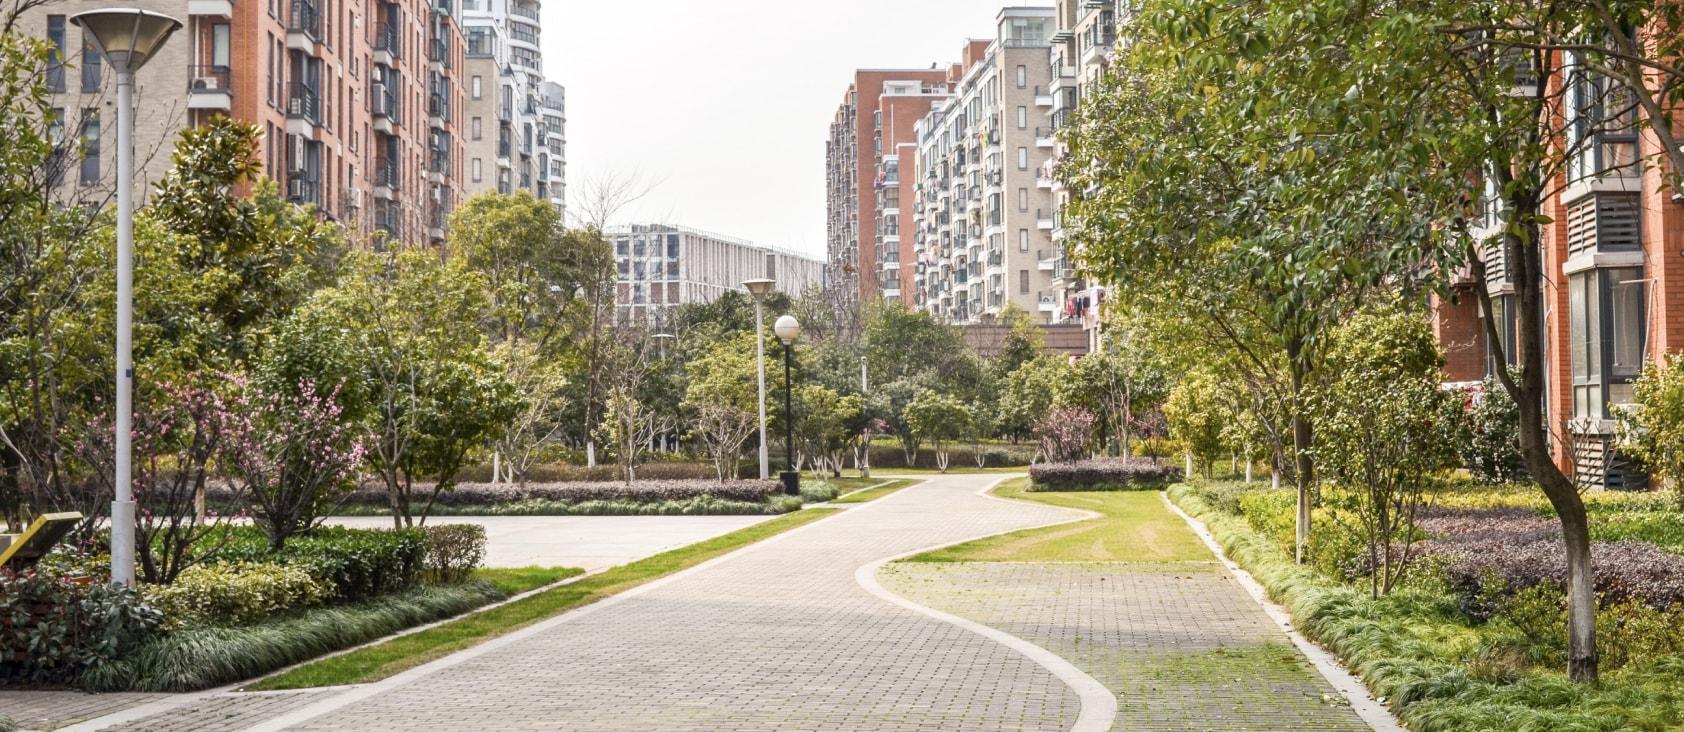 view of landscape outside apartment complex